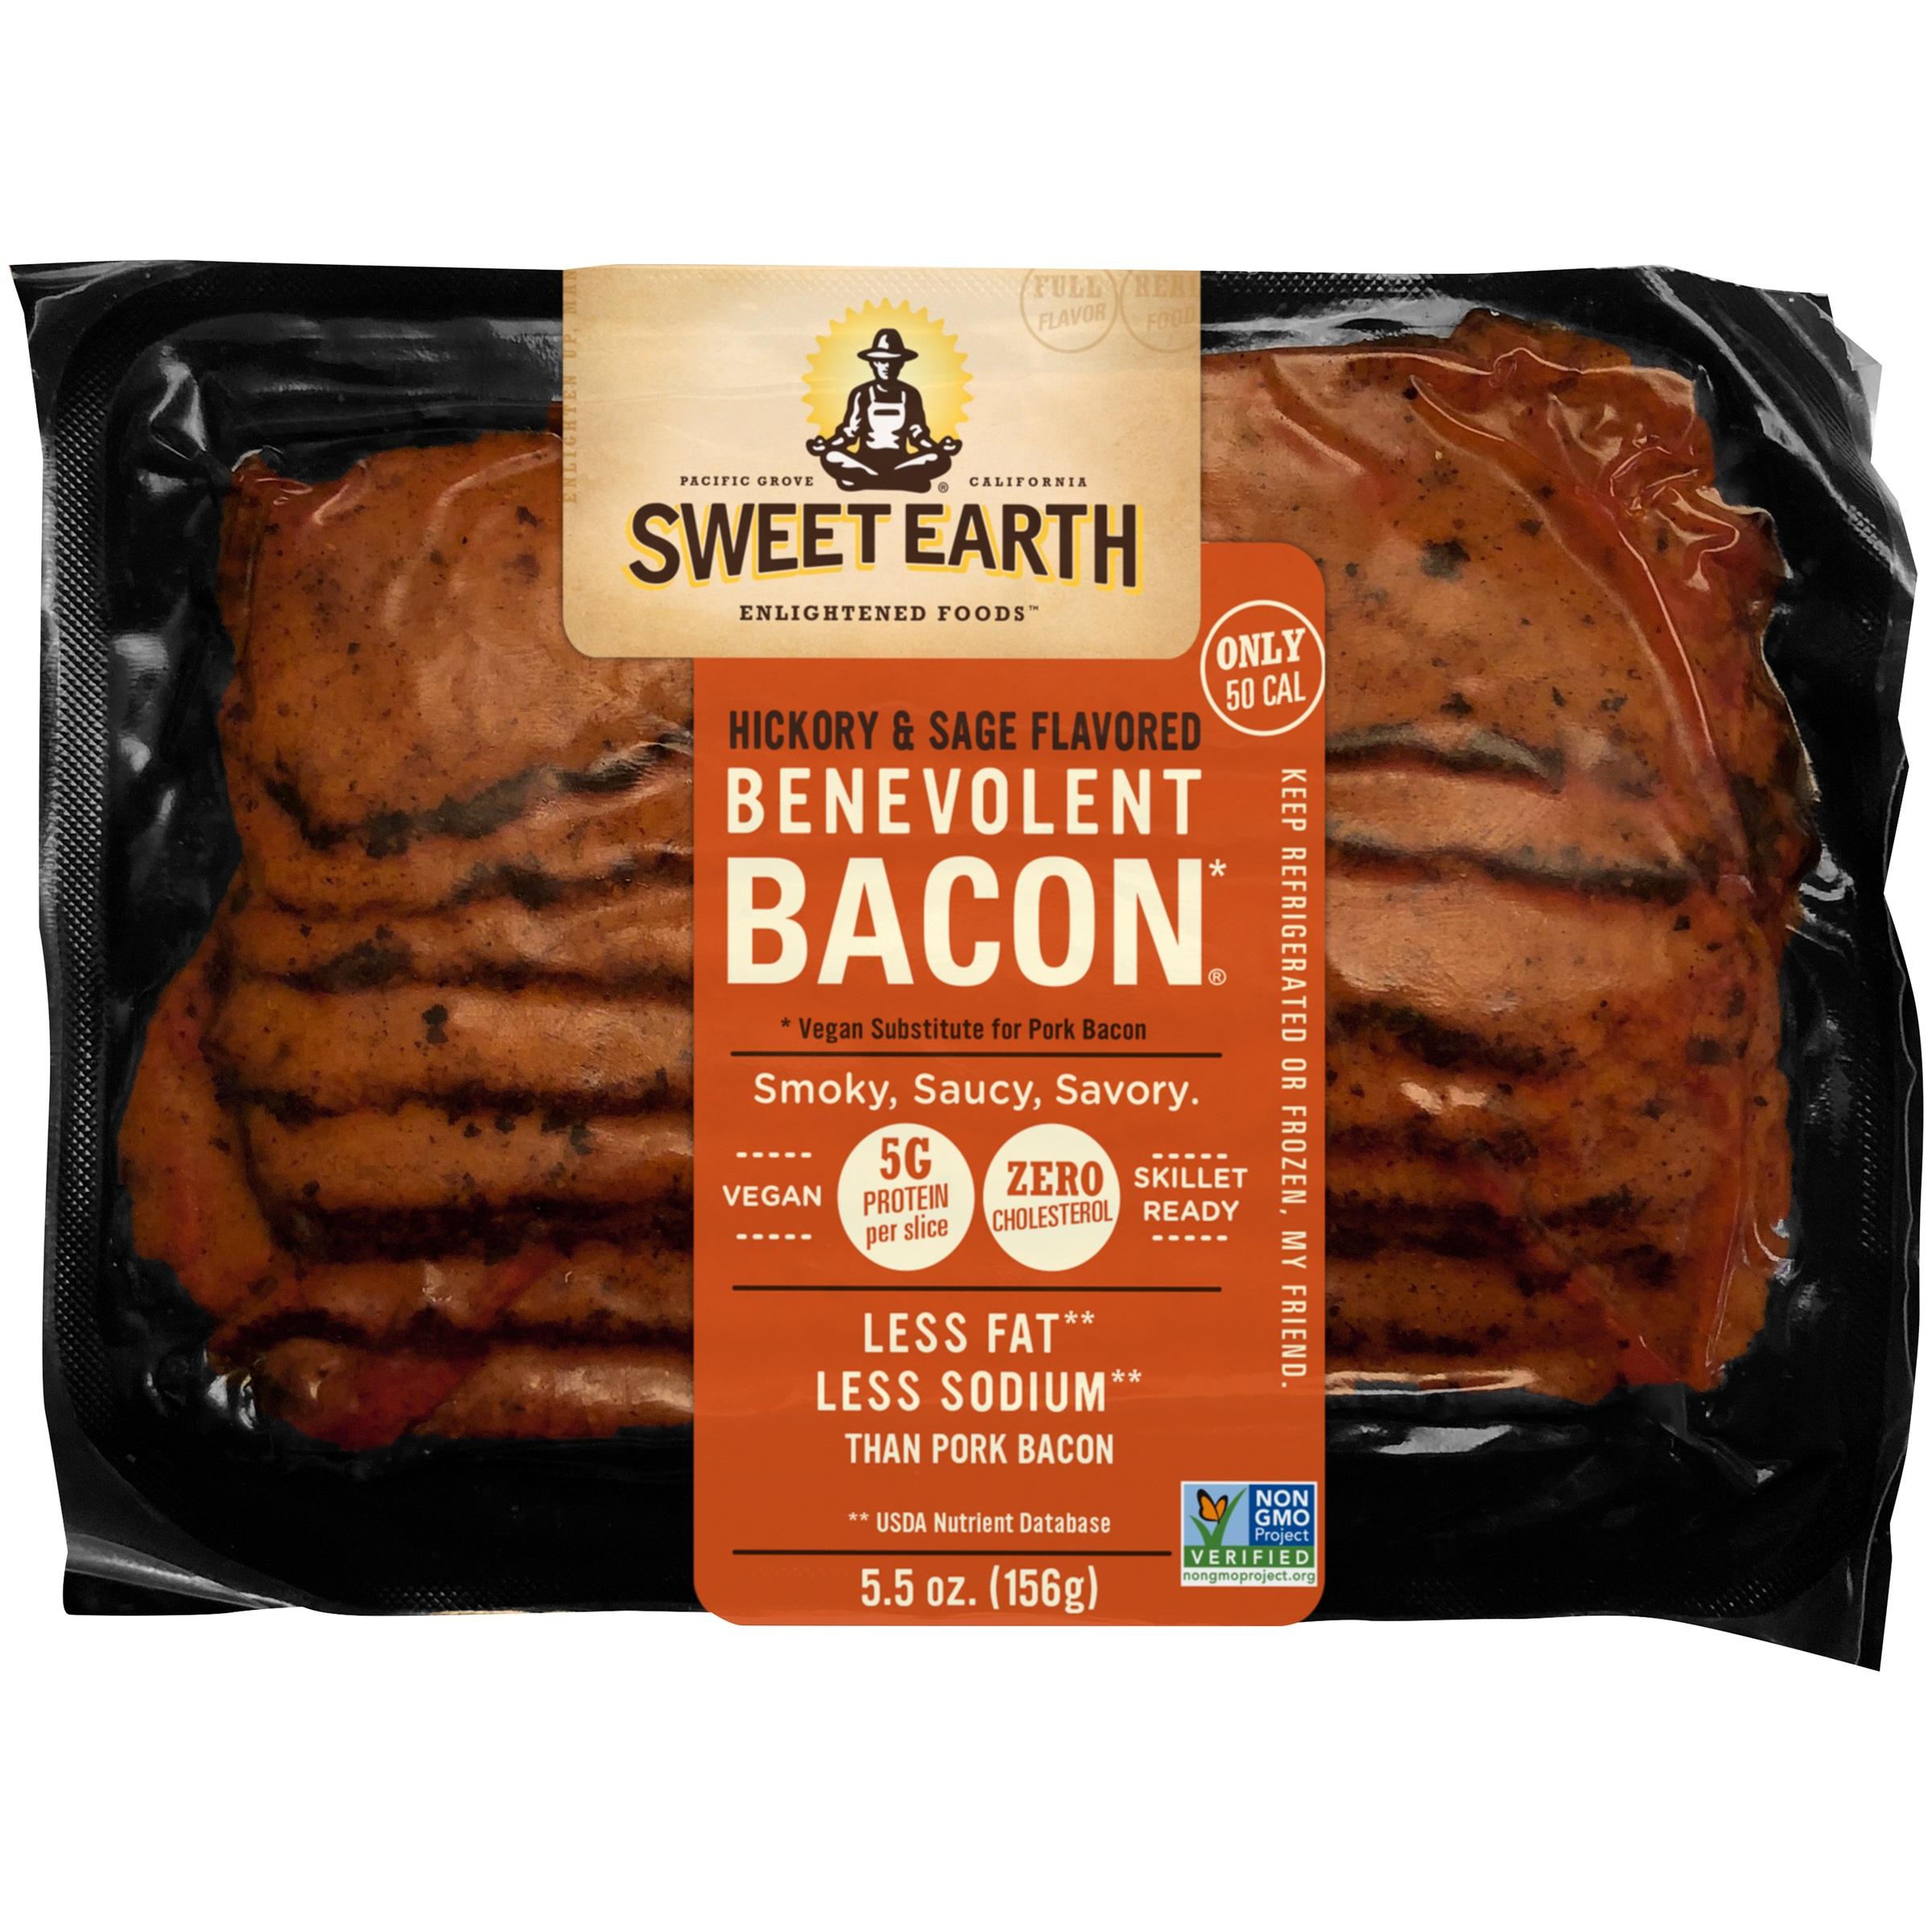 Sweet Earth Natural Foods Vegan Hickory & Sage Smoked Seitan Bacon